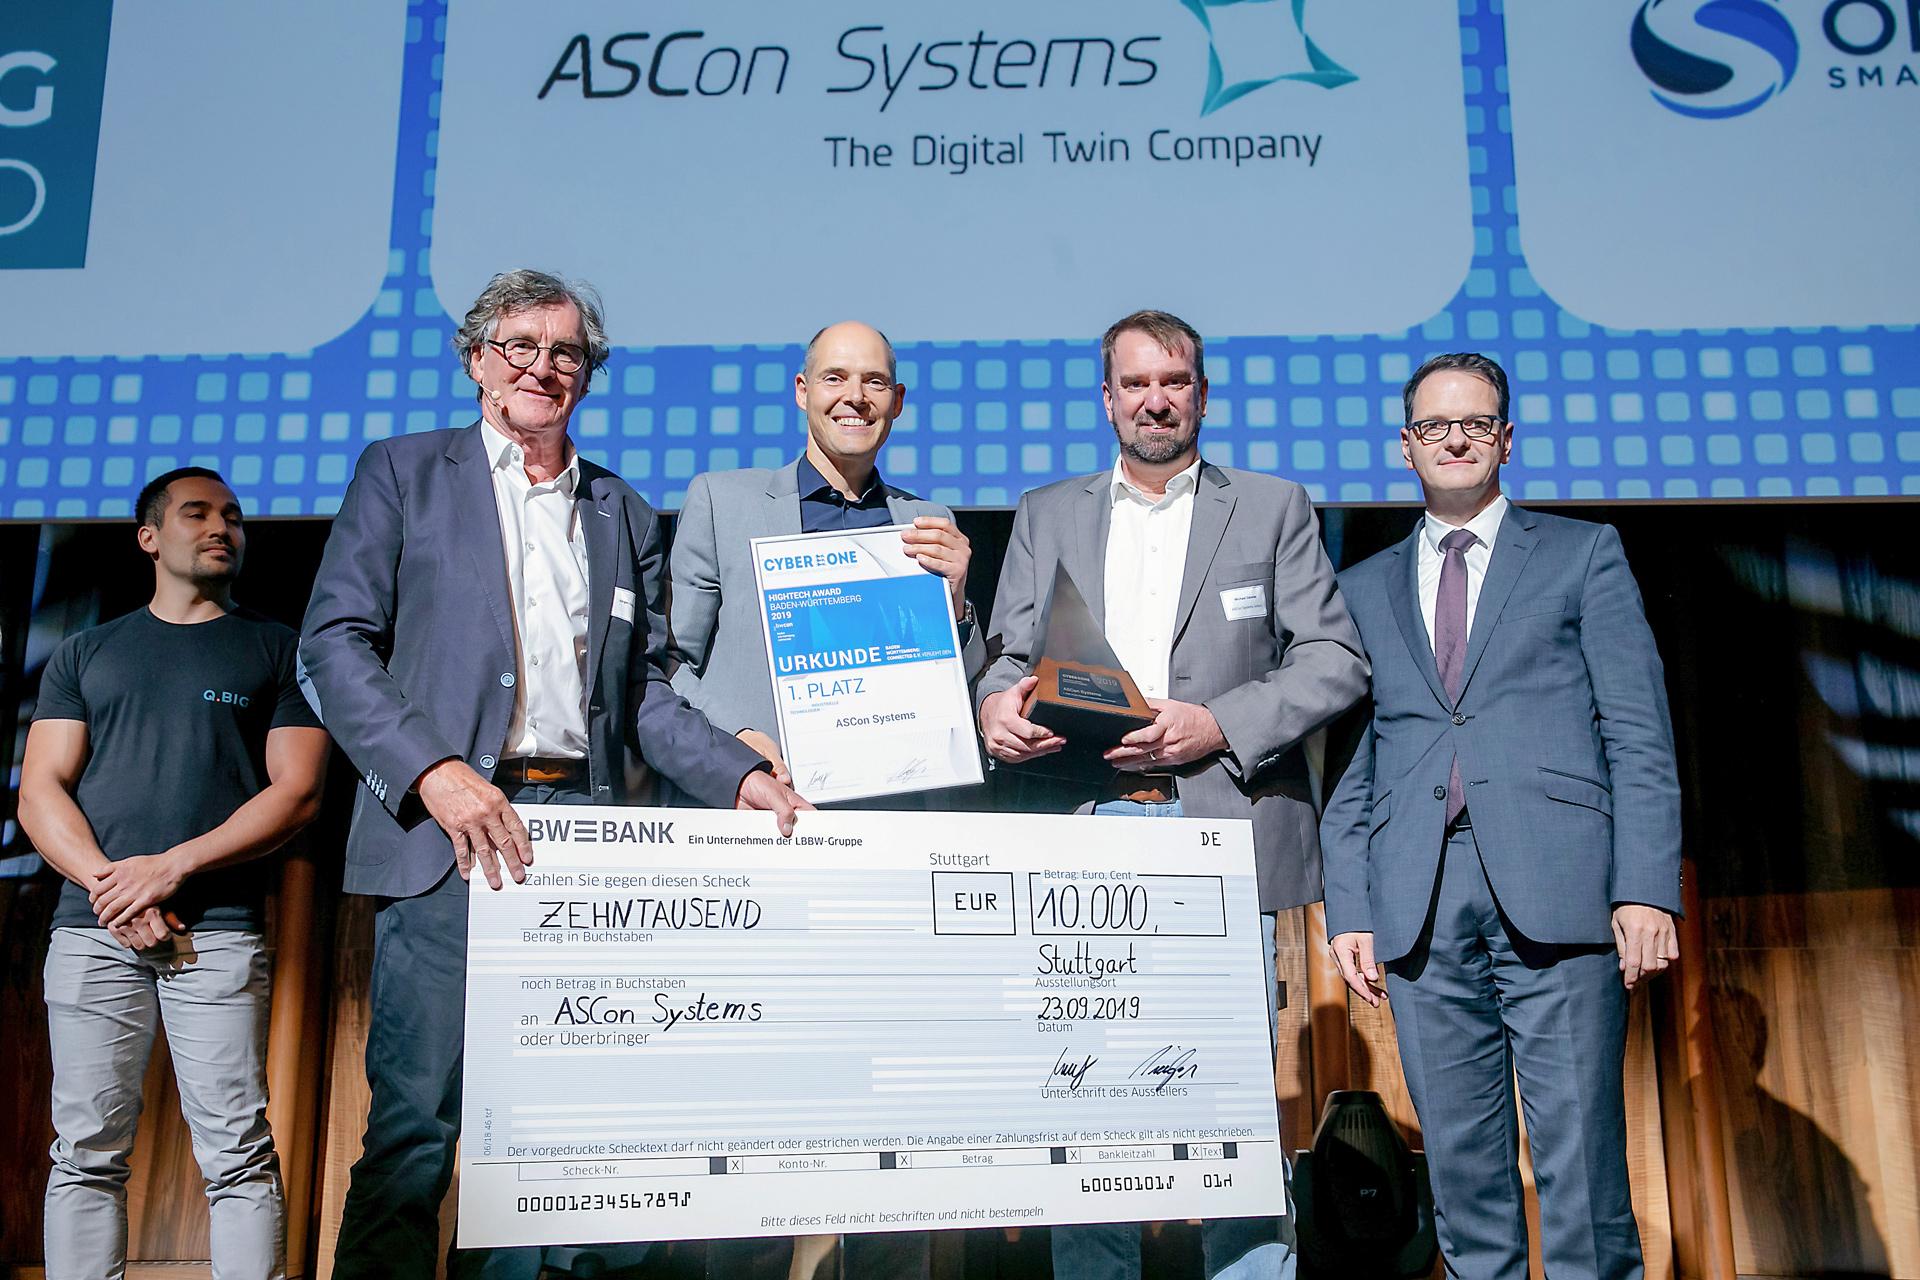 CyberOne Hightech Award